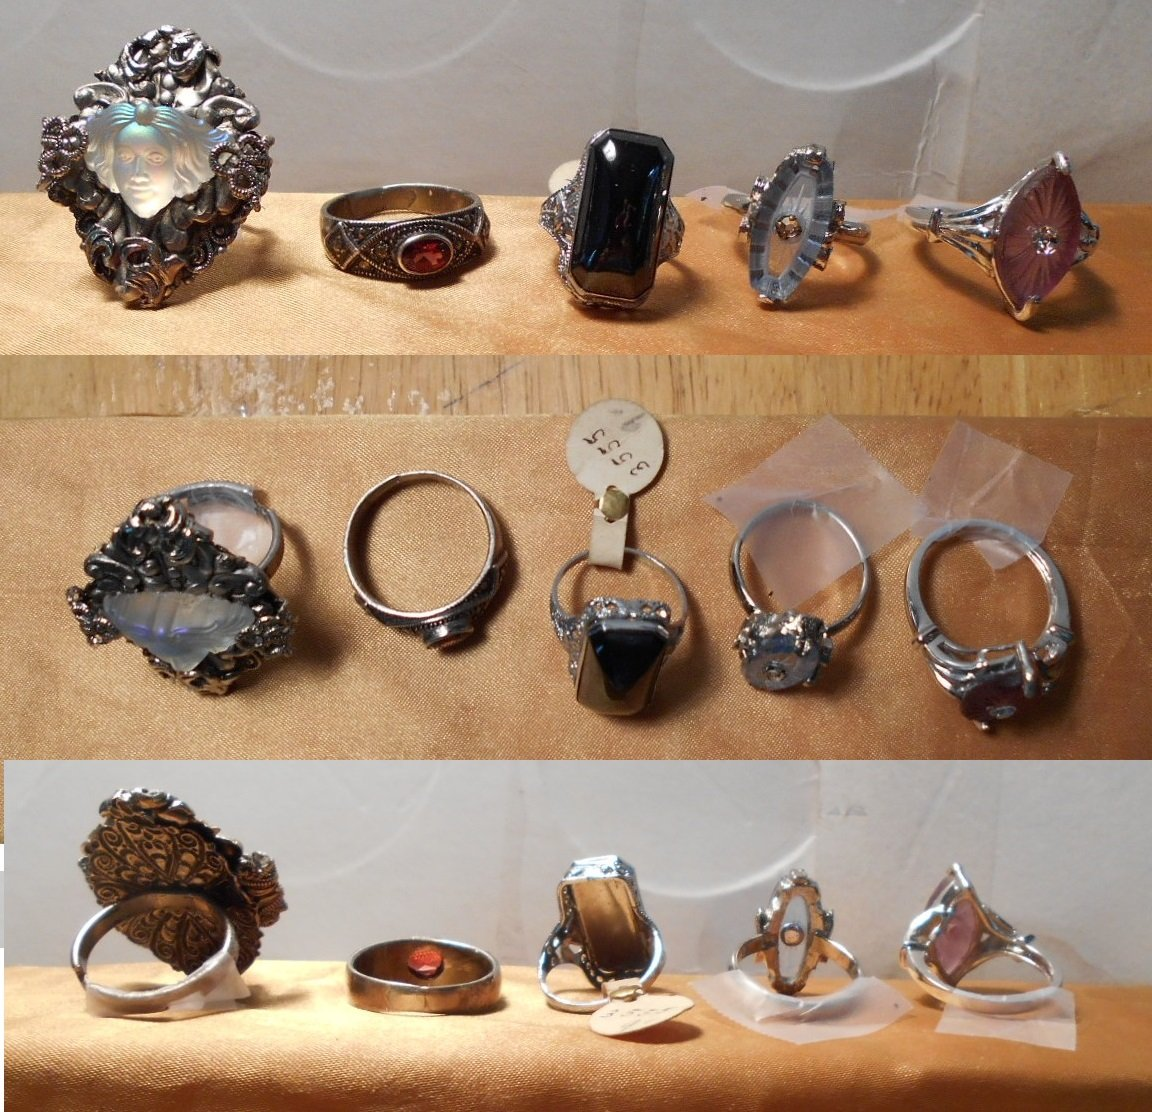 1 Vintage Purple Camphor Glass Ring w/ Rhinestone, Vintage Amethyst Starburst Camphor Marquise Shape, New Marked 925. Size 6 1/2. OOAK! by EMENOW